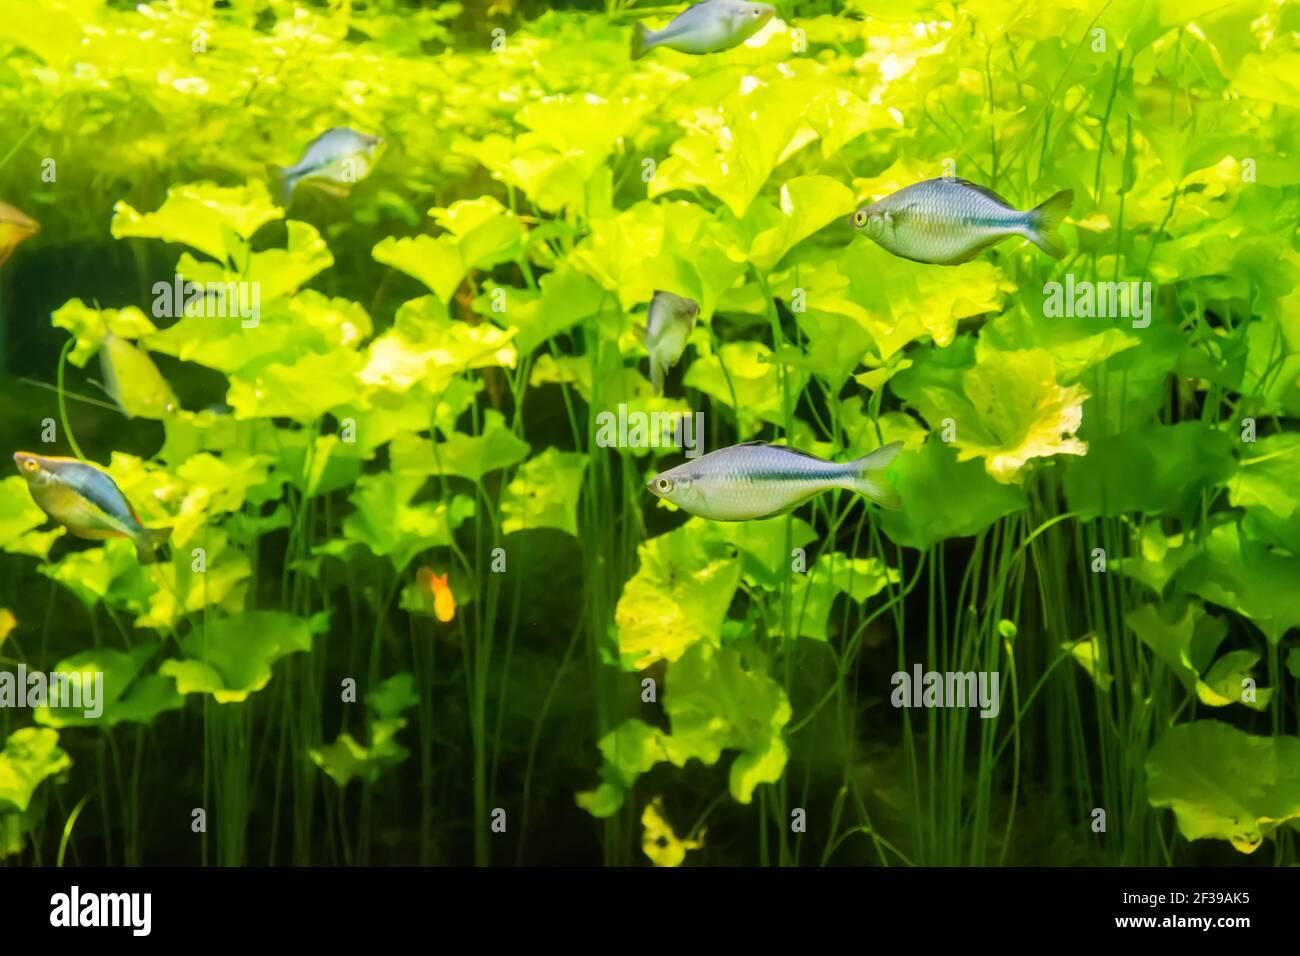 Aquarium de rivière poissons dans un aquarium avec des algues vertes Banque D'Images